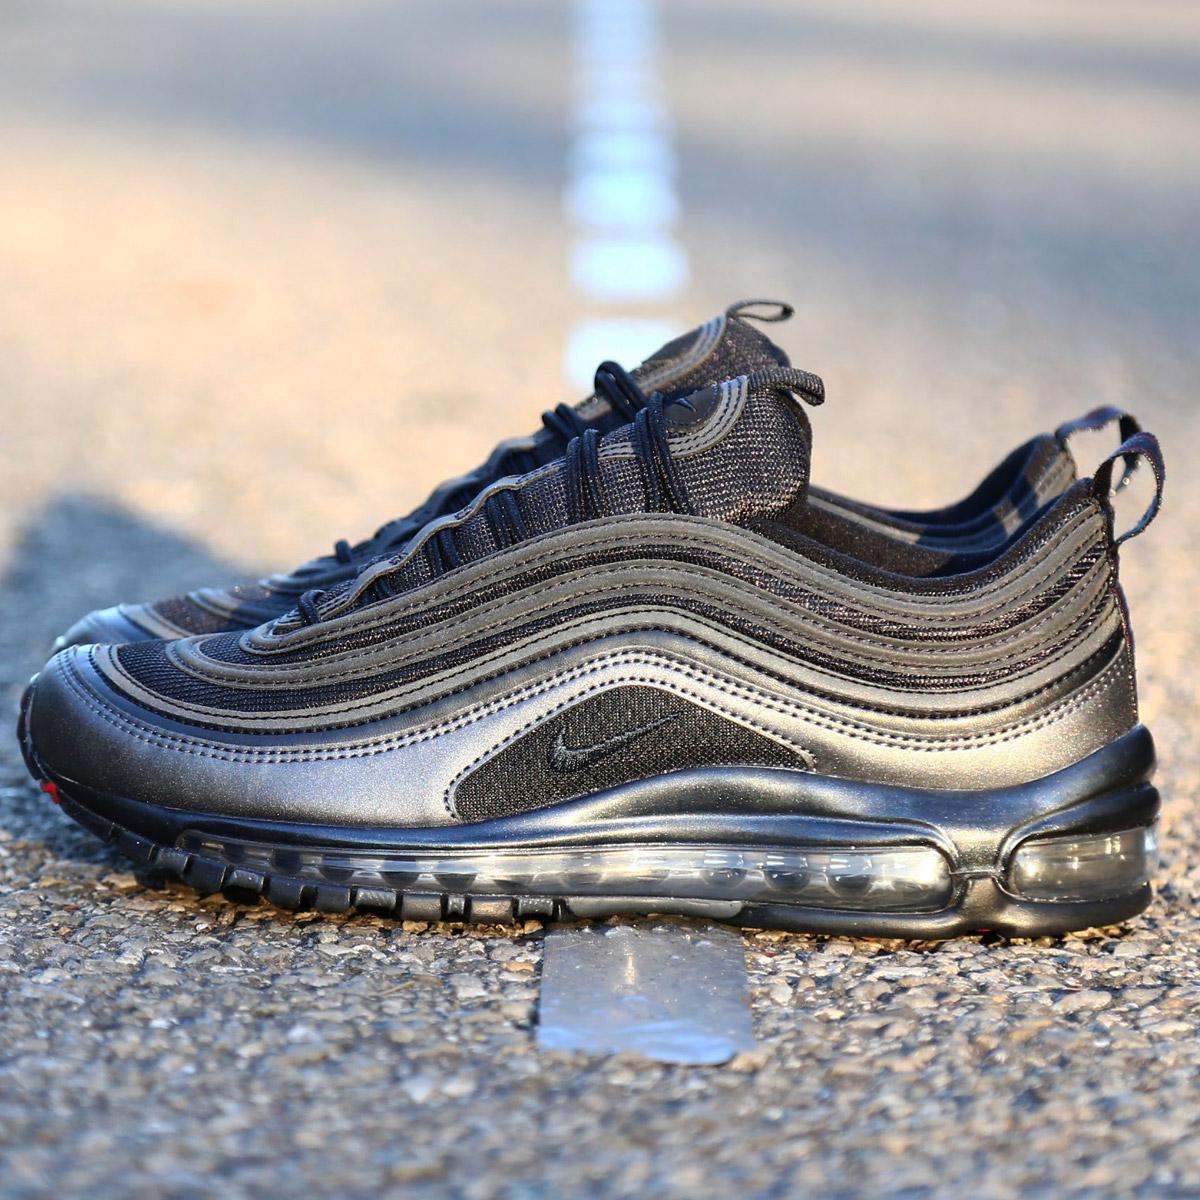 Nike Air Max 97 BlackAnthracite Metallic Hematite 921826 005